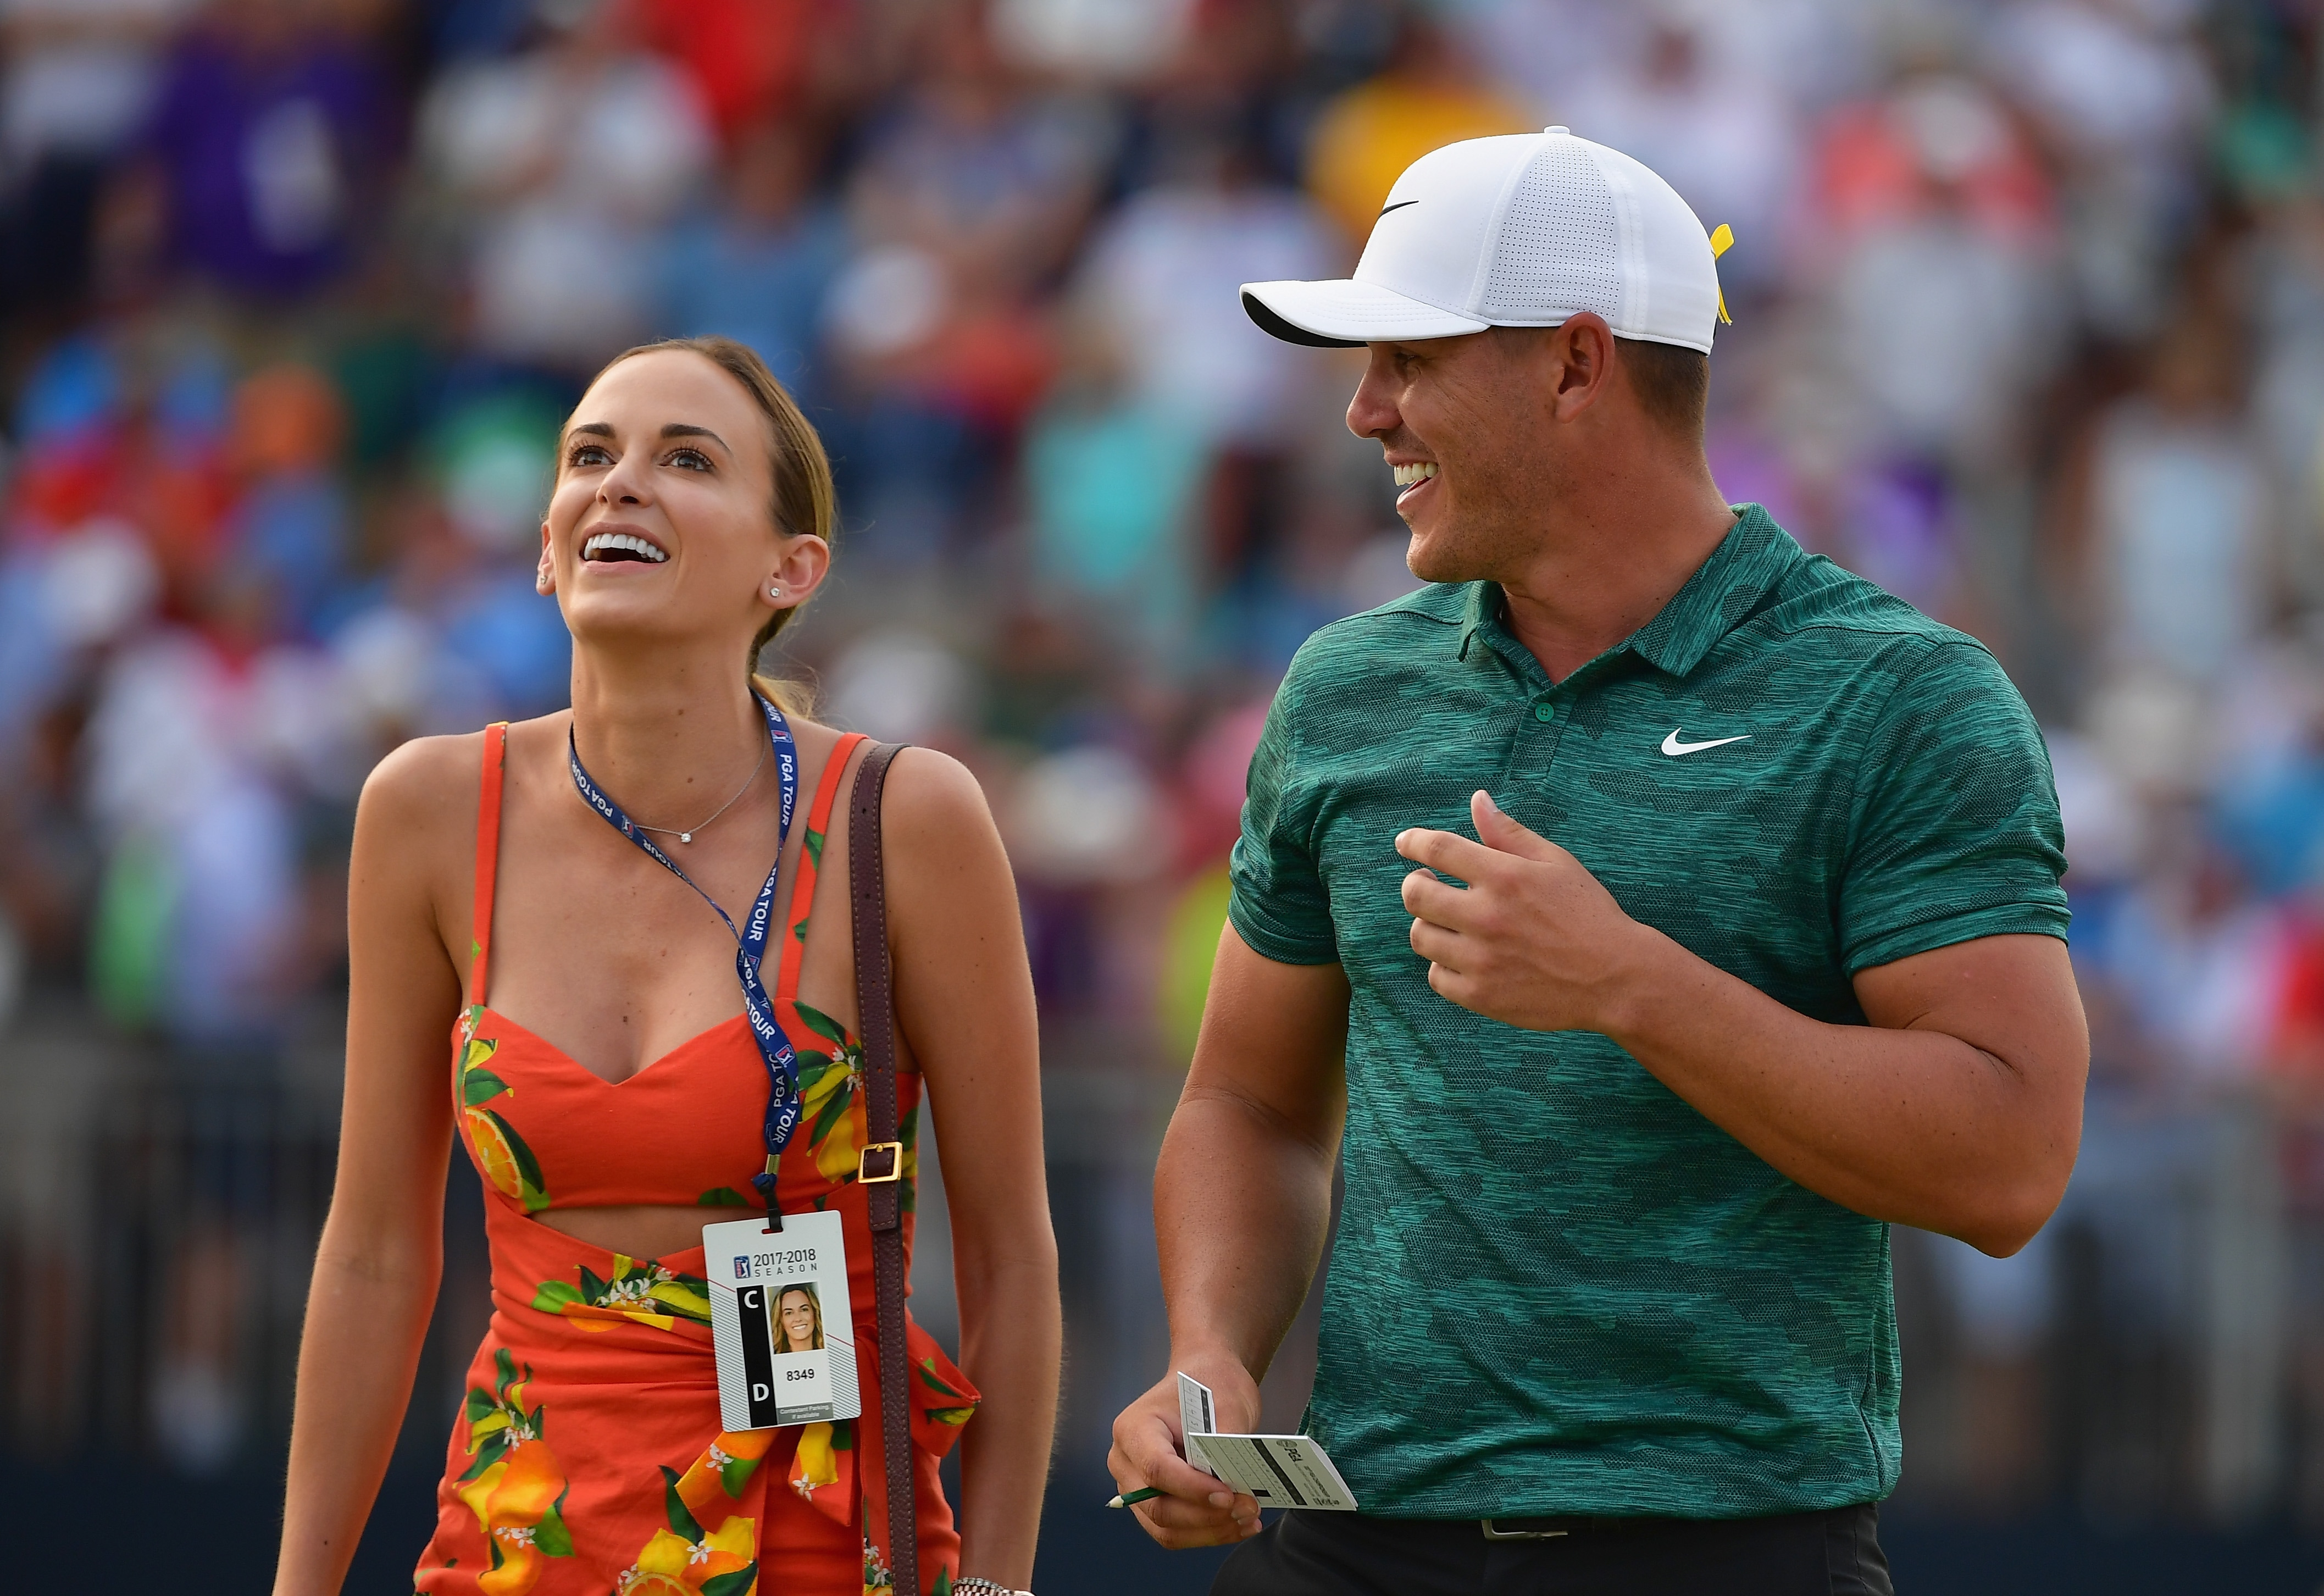 Jena Sims and Brooks Koepka at the 2018 PGA Championship